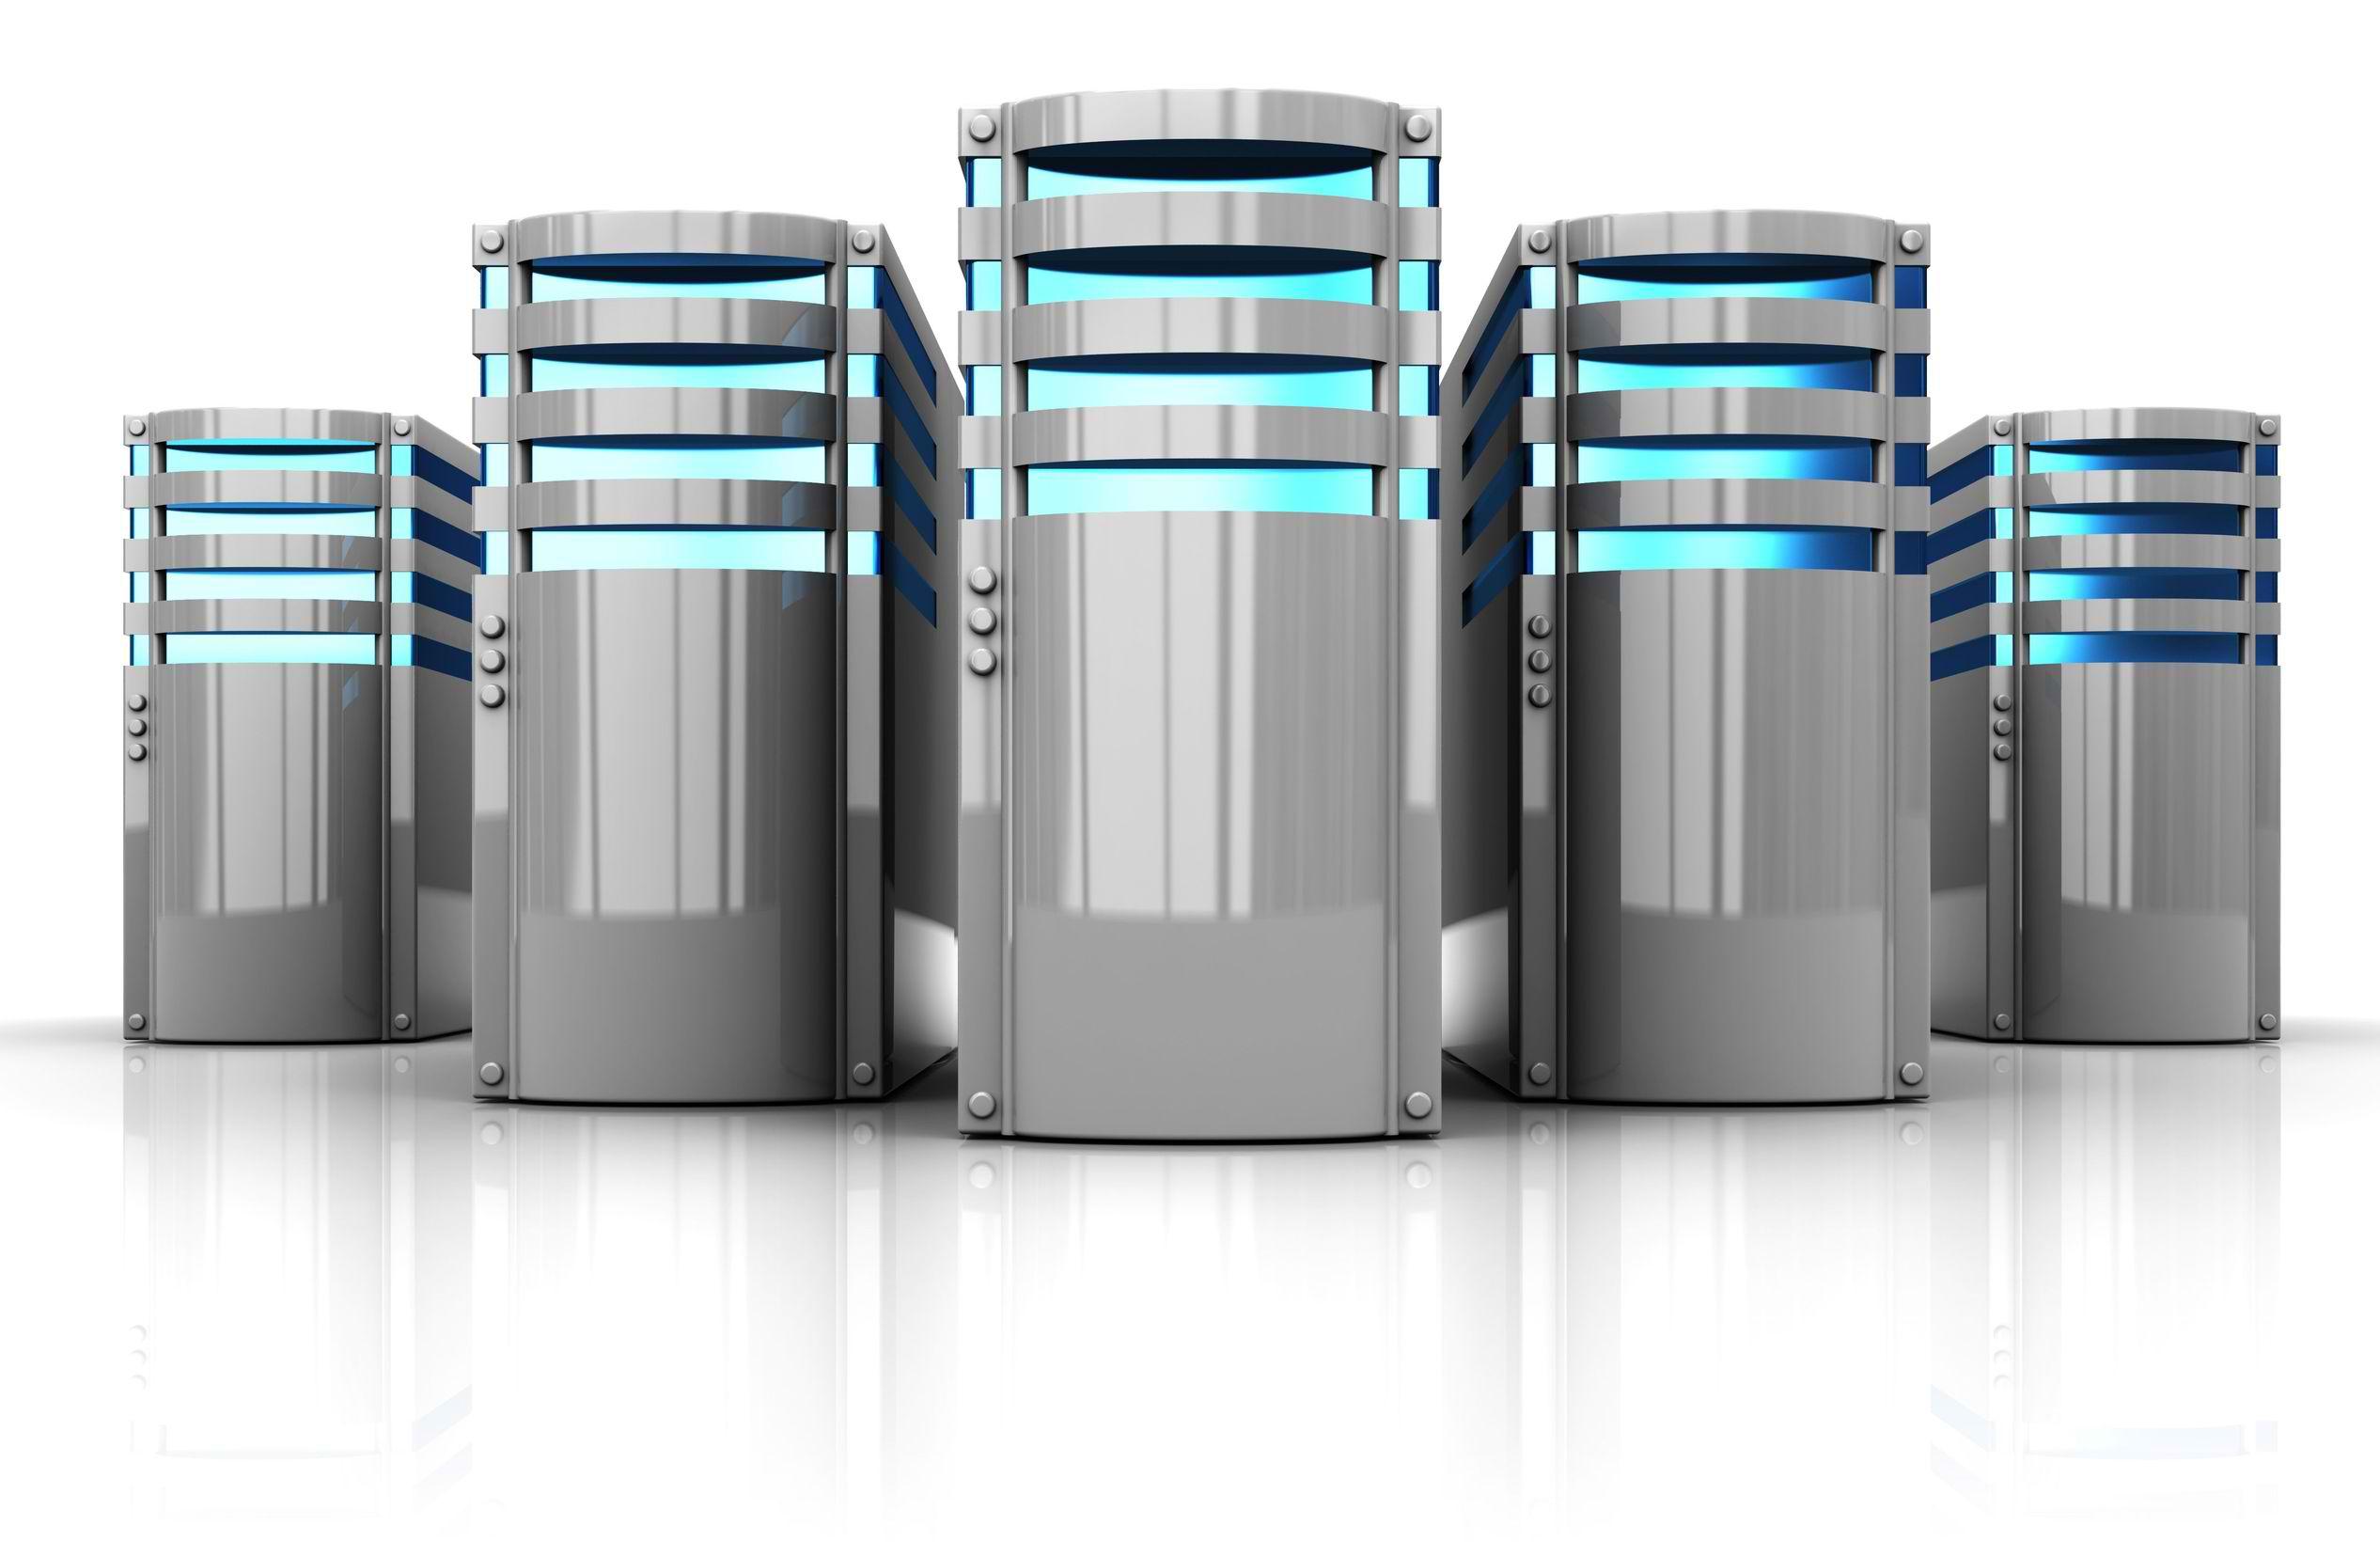 web hosting machine